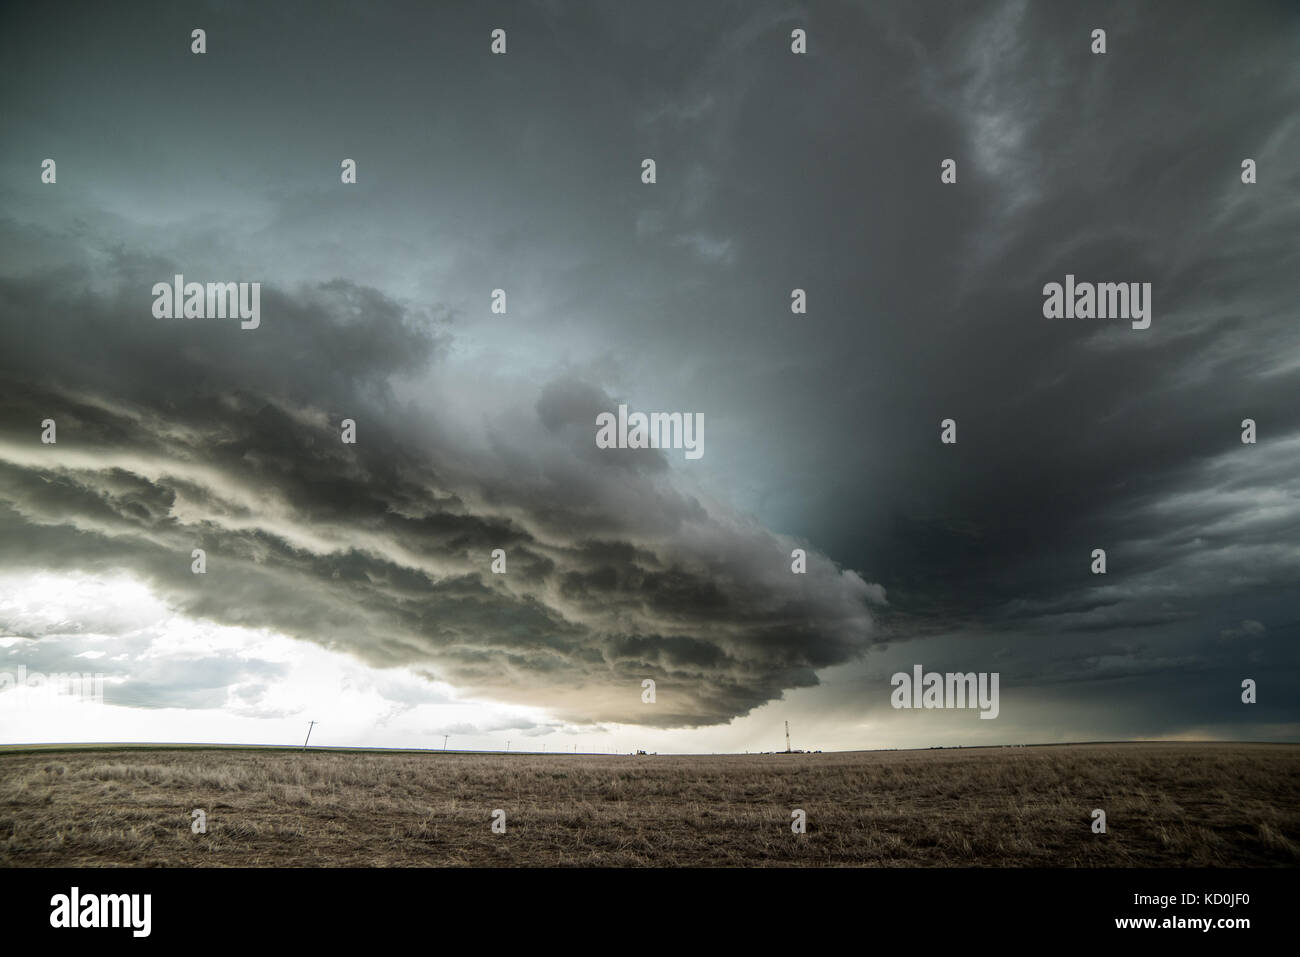 Tornado warned supercell in the eastern Colorado Plains, Yuma, Colorado, USA Stock Photo